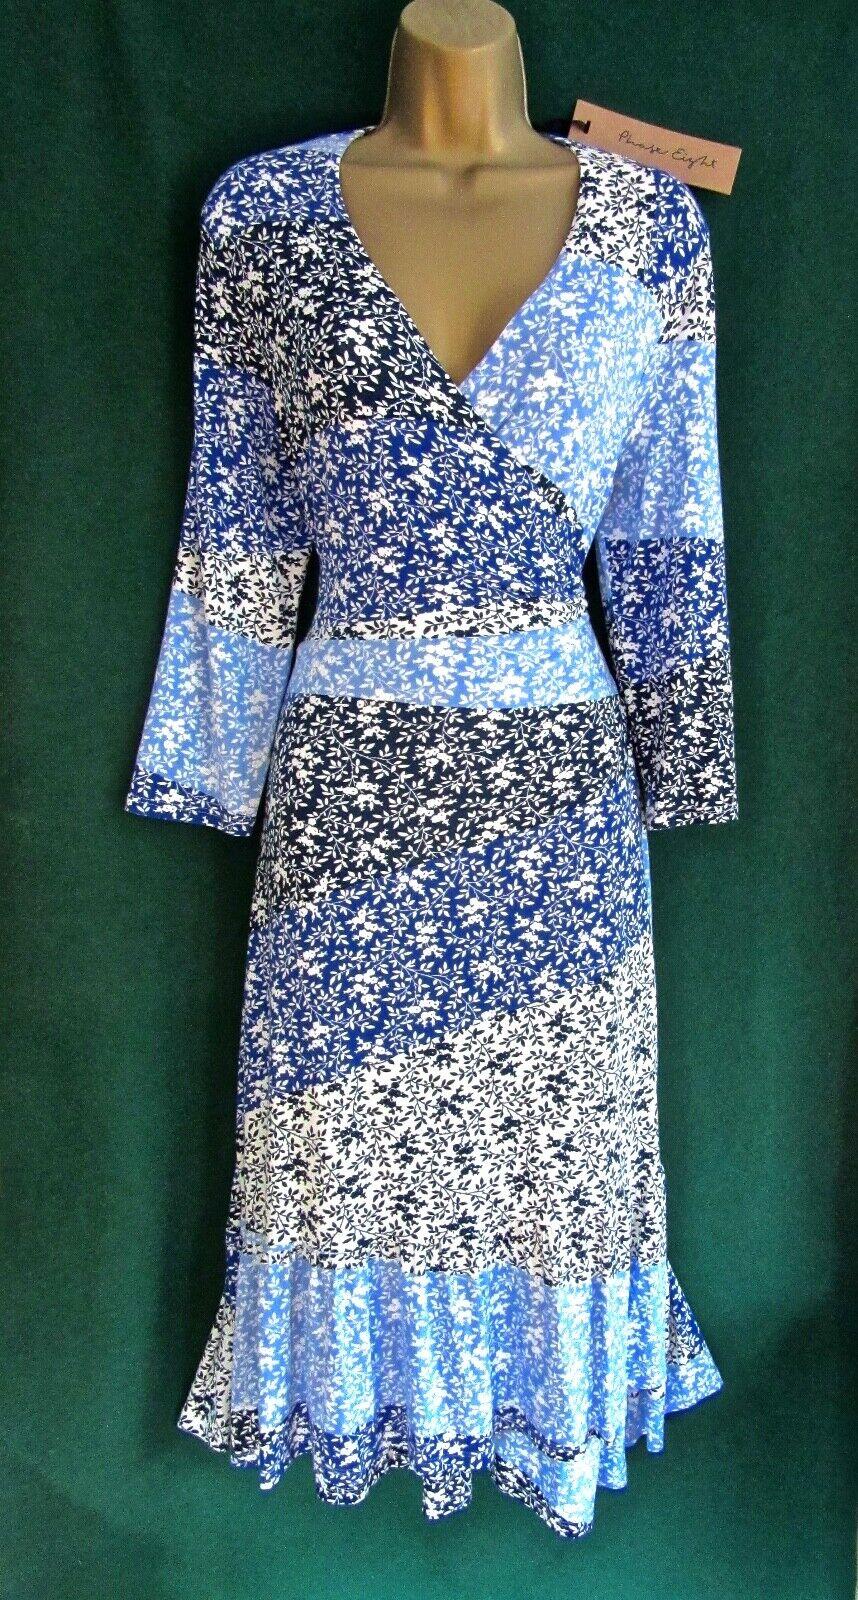 New PHASE EIGHT 8 UK 14 16 PETA bluee White Ditsy Floral Jersey Midi WRAP DRESS